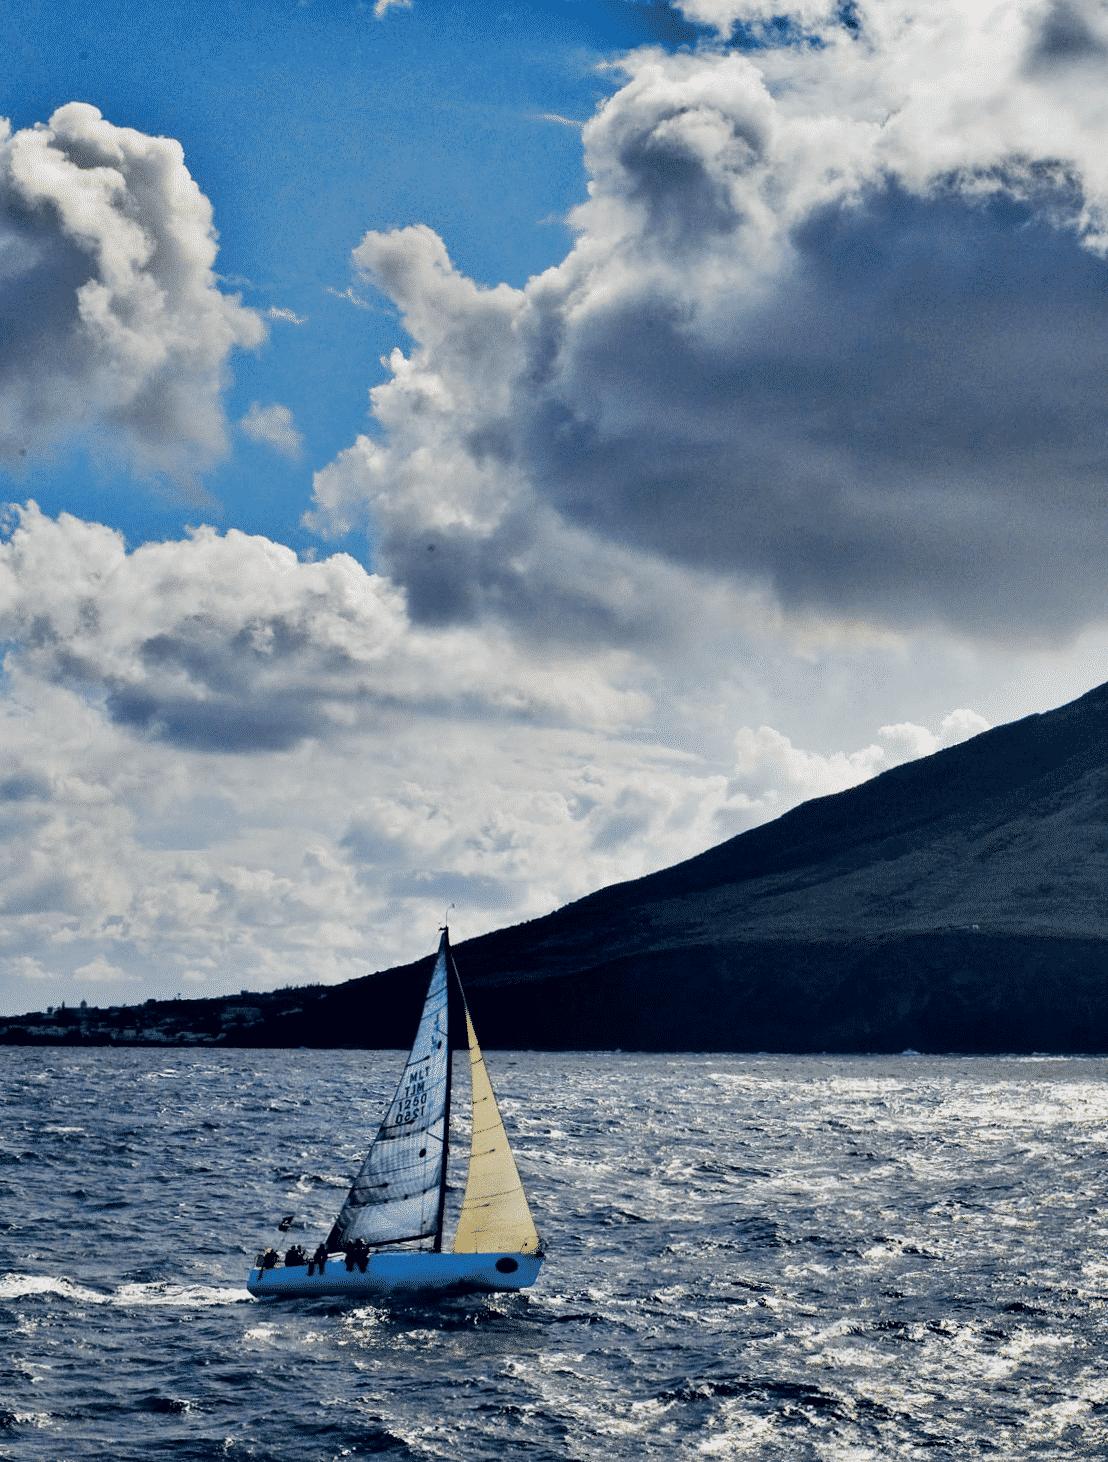 rallye gara regata